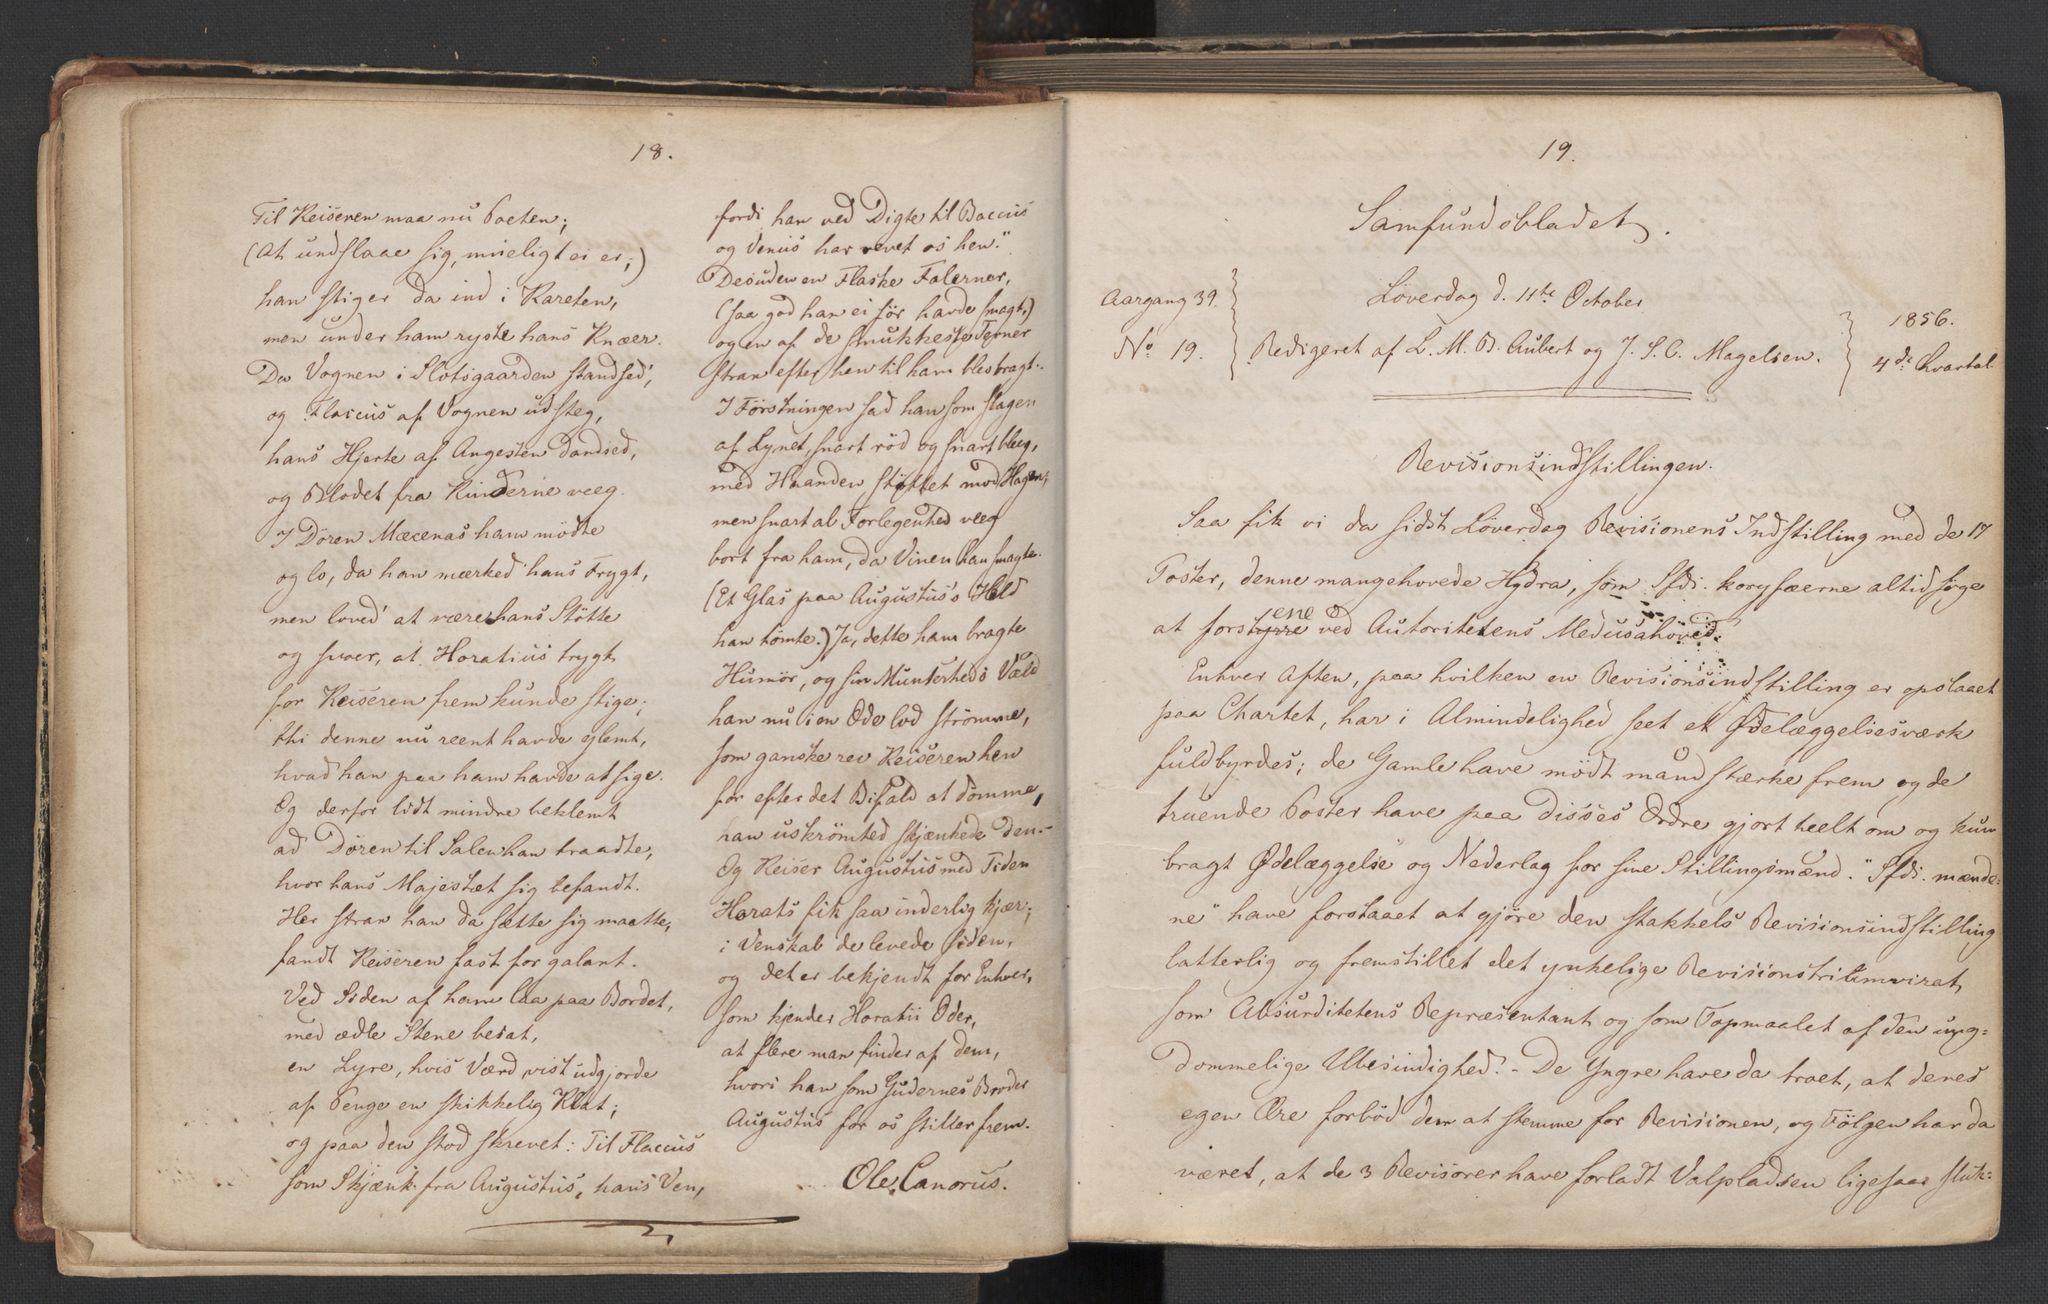 RA, Det Norske Studentersamfund, X/Xa/L0006, 1856-1857, s. 13